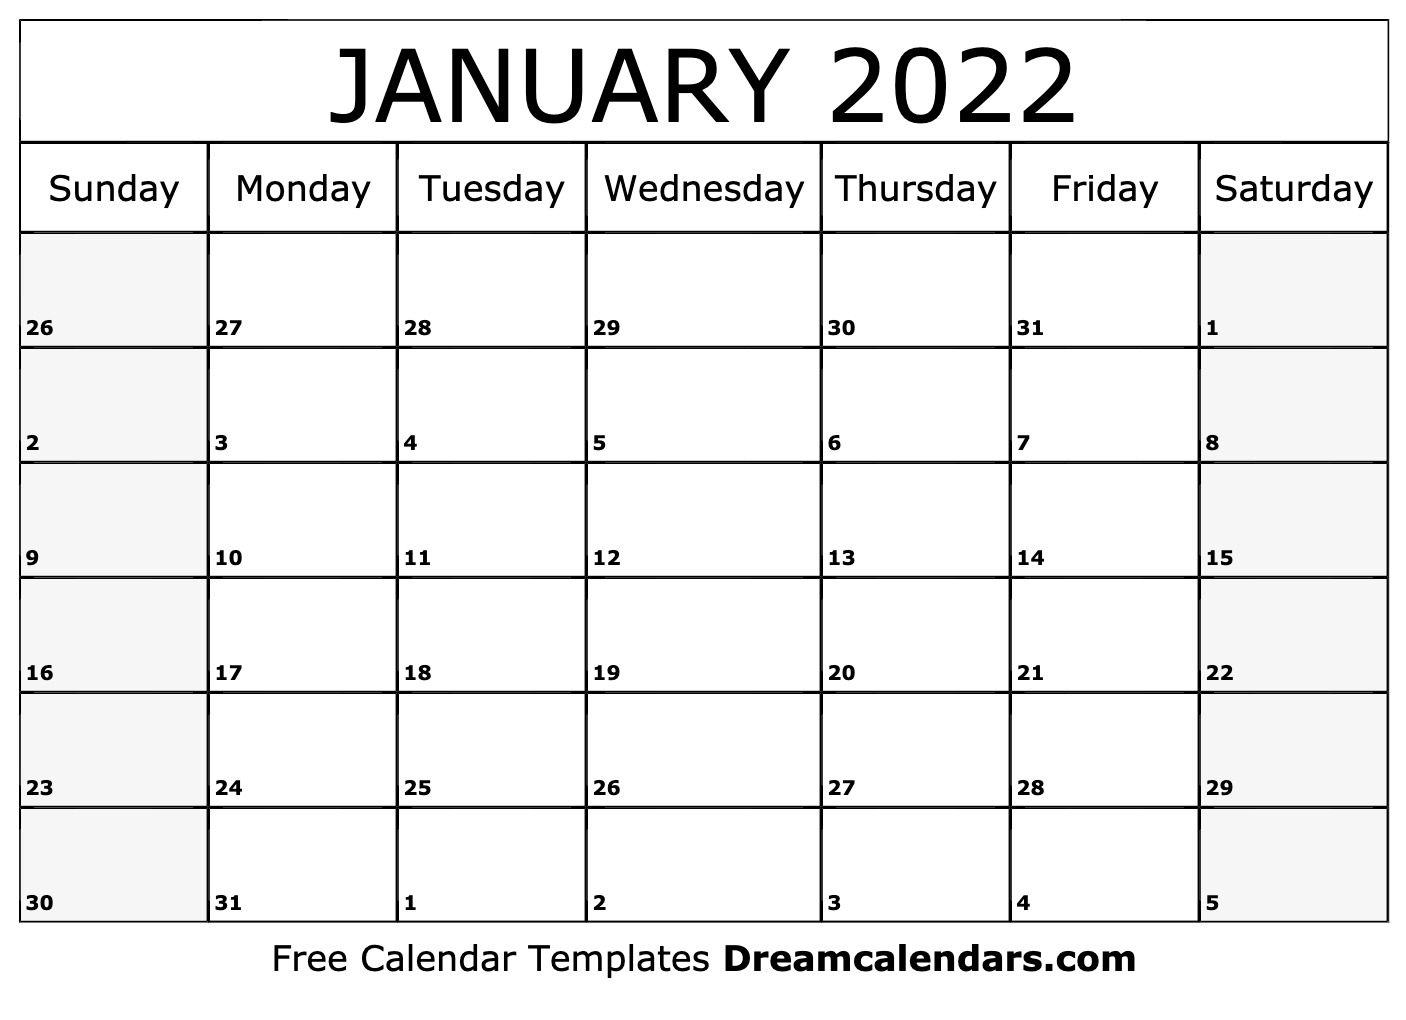 January 2022 Calendar | Free Blank Printable Templates Throughout Januarycalendar 2022 With Holidays